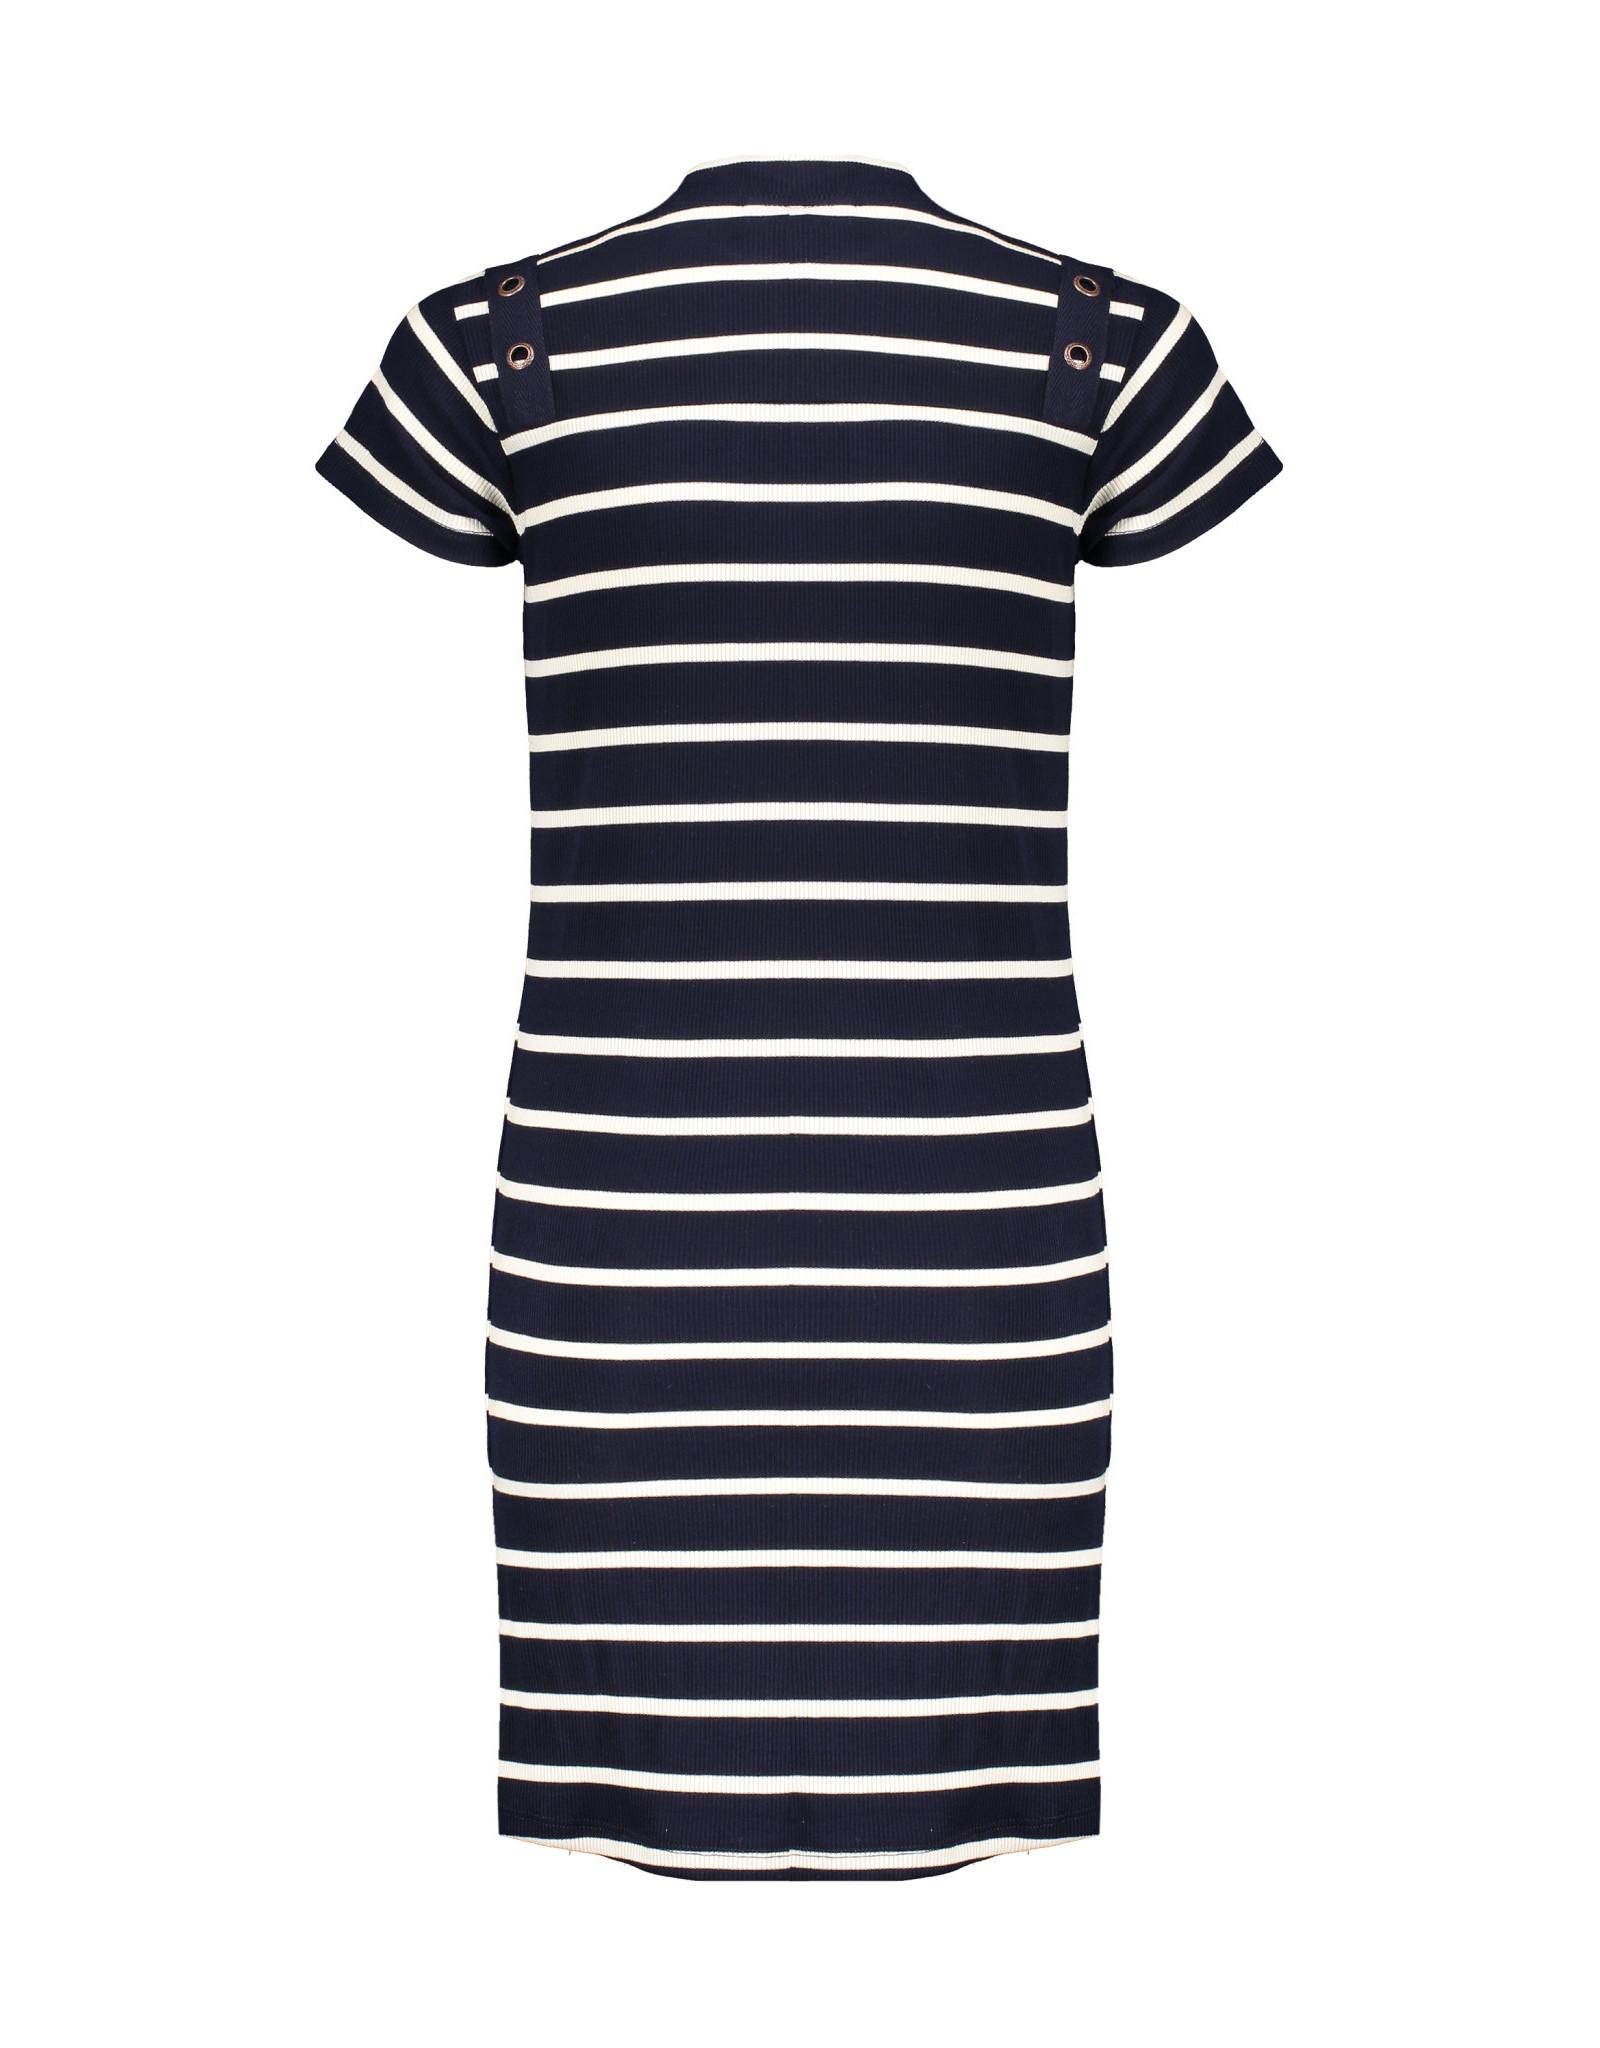 NoBell NoBell meiden jersey rib jurk MizzyB Grey Navy